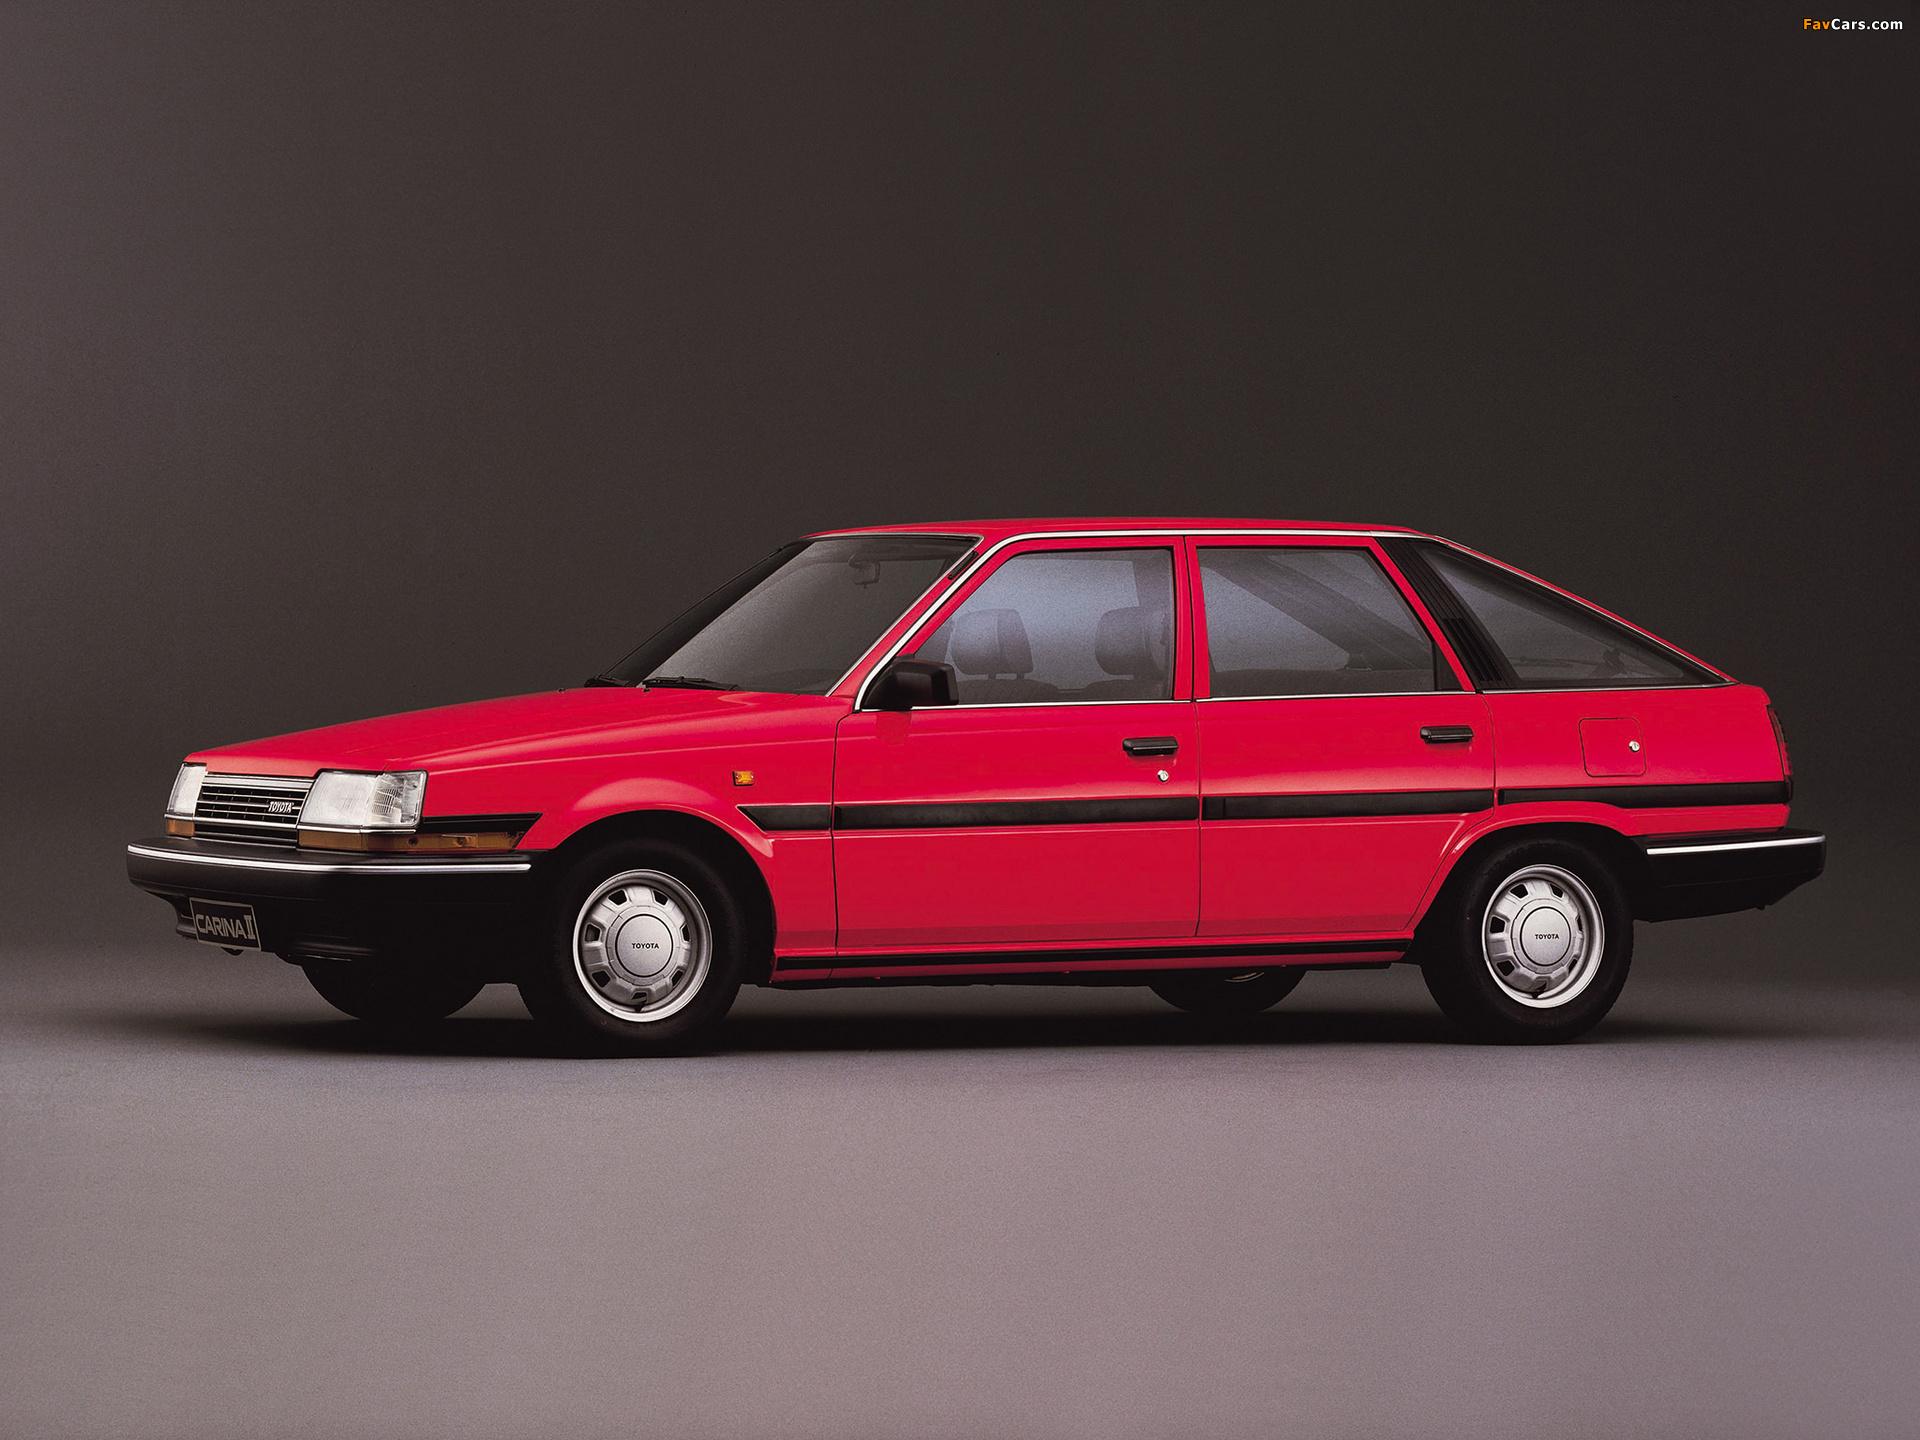 Toyota Carina Ii Liftback T150 1984 87 Photos 1920x1440